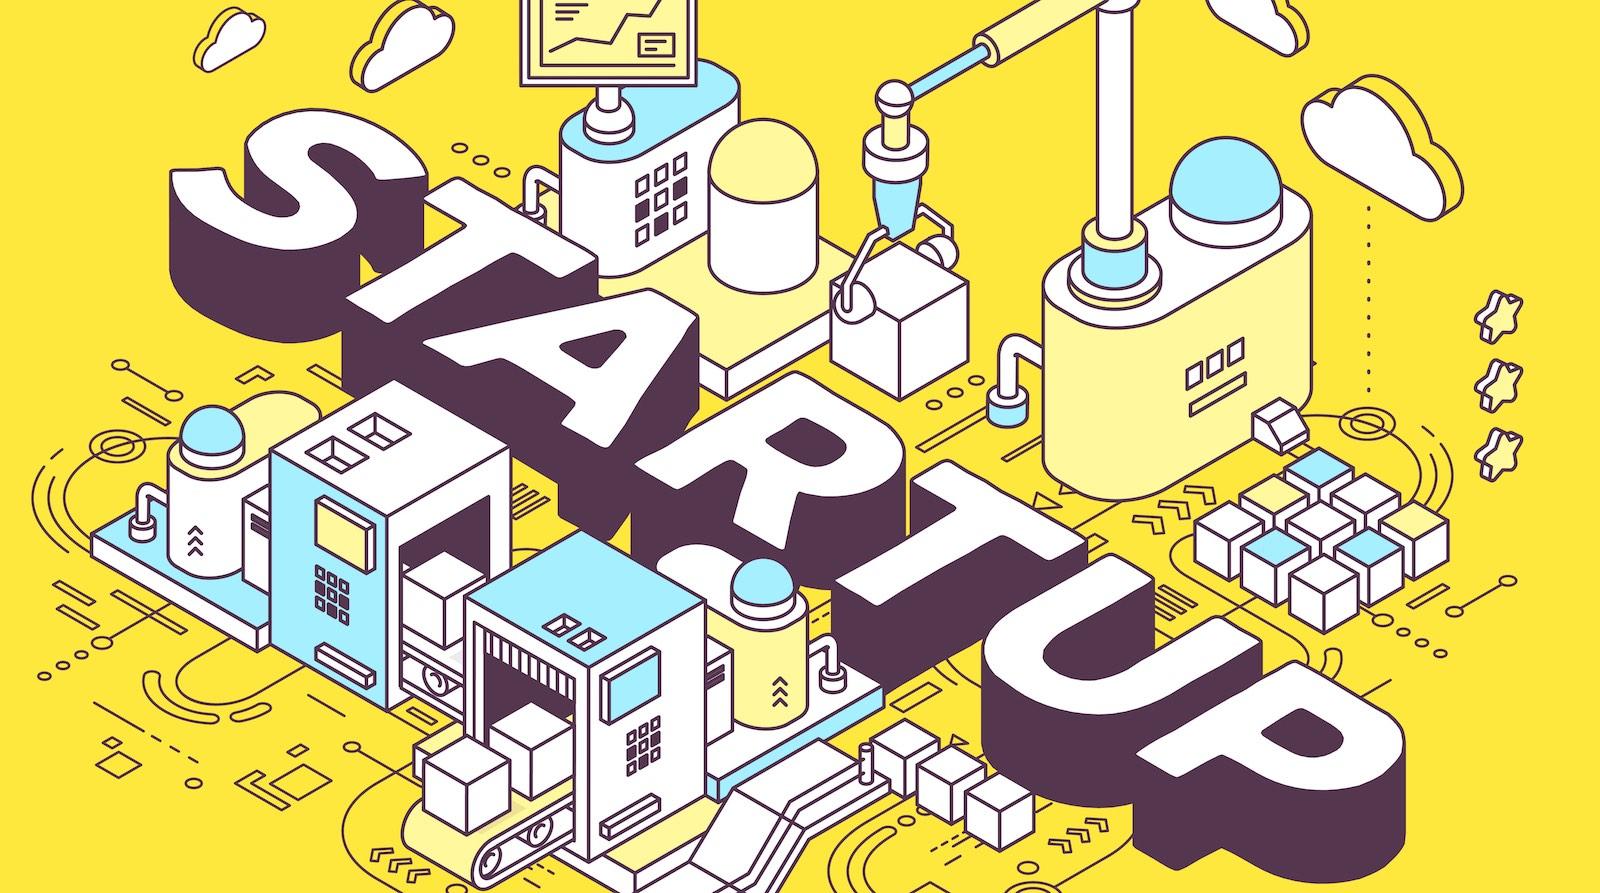 Memahami Valuasi Startup agar Lebih Melek Finansial